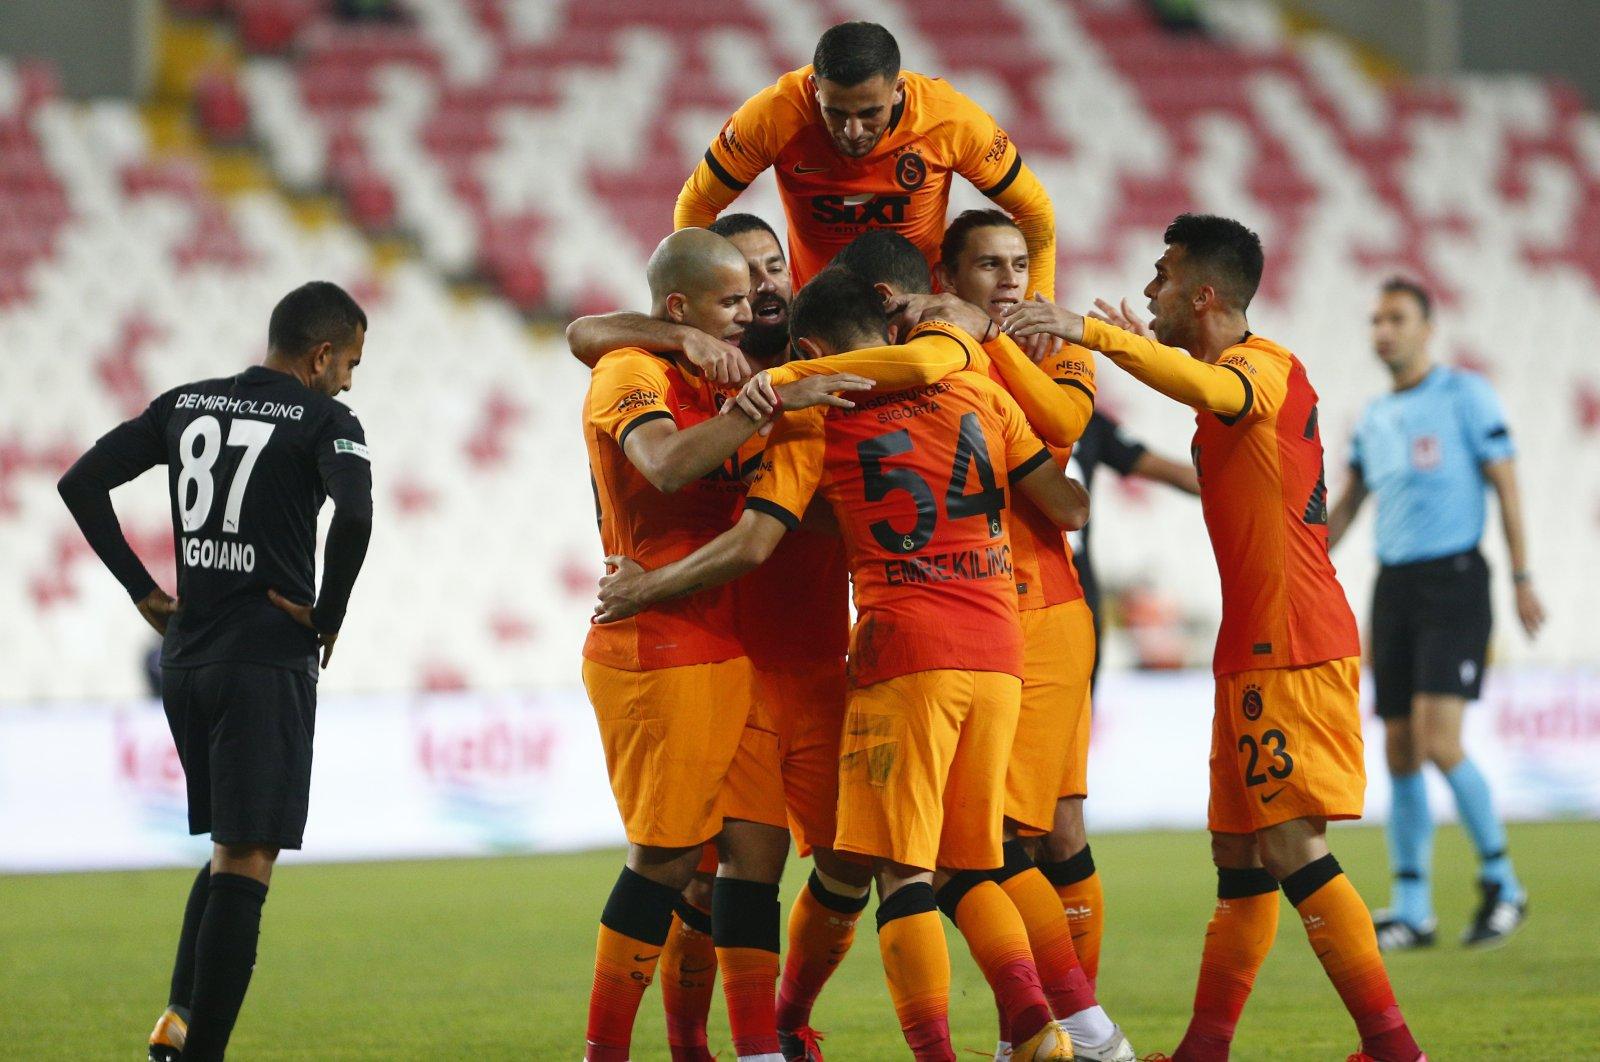 Galatasaray players celebrate a goal against Sivasspor during a Süper Lig match in Sivas, Turkey, Nov. 8, 2020. (AA Photo)